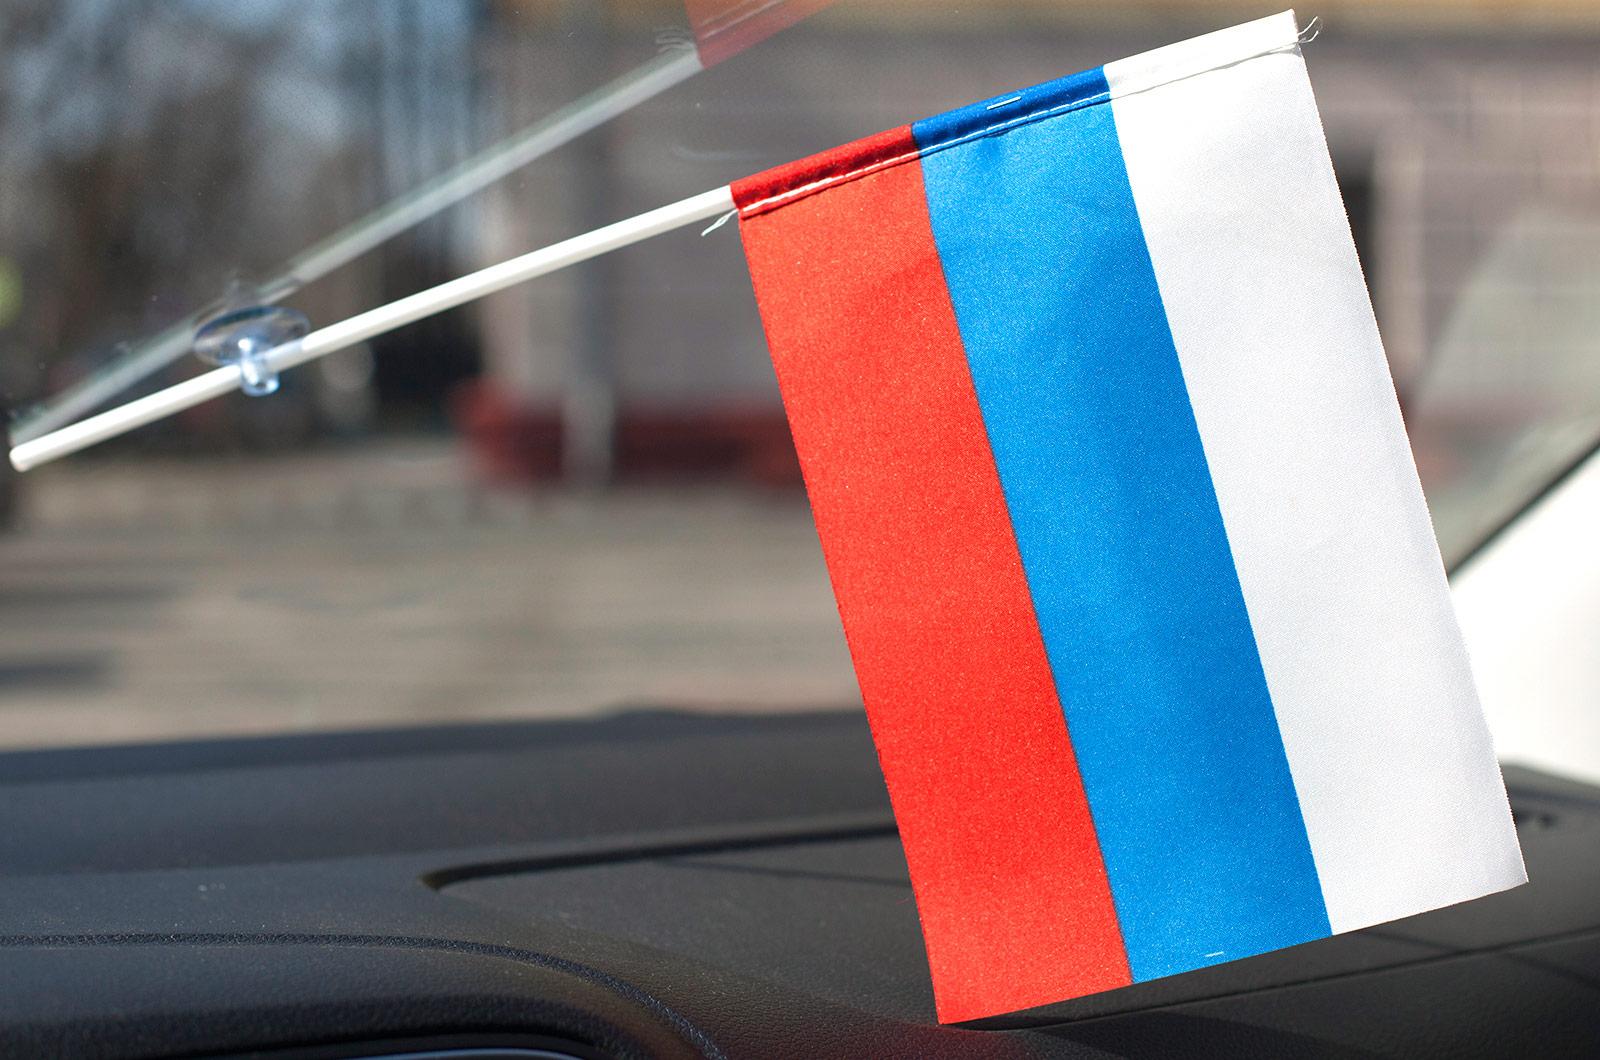 Российский флаг РФ на палочке